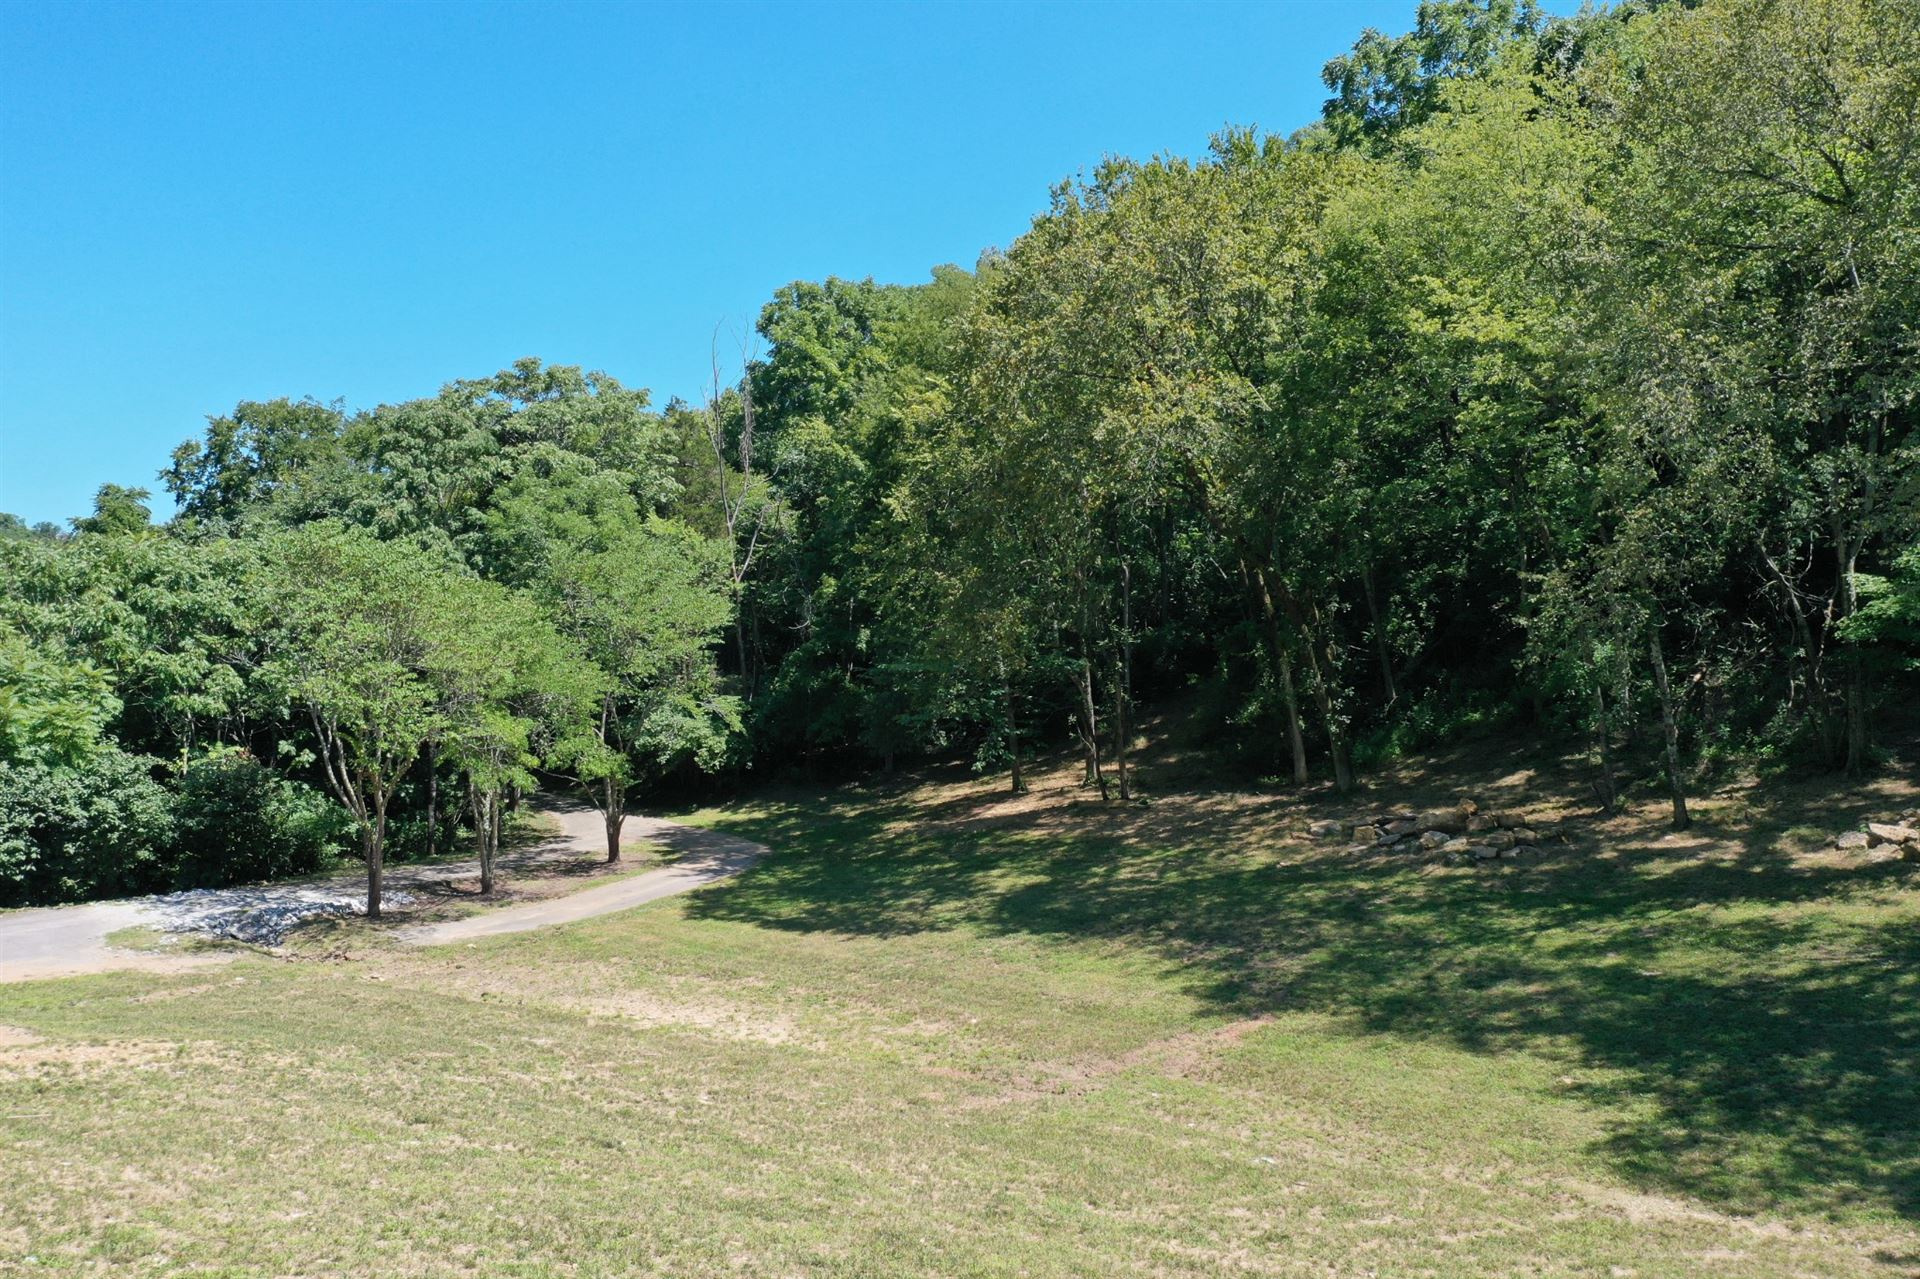 Photo of 6027 Murray Ln, Brentwood, TN 37027 (MLS # 2131592)